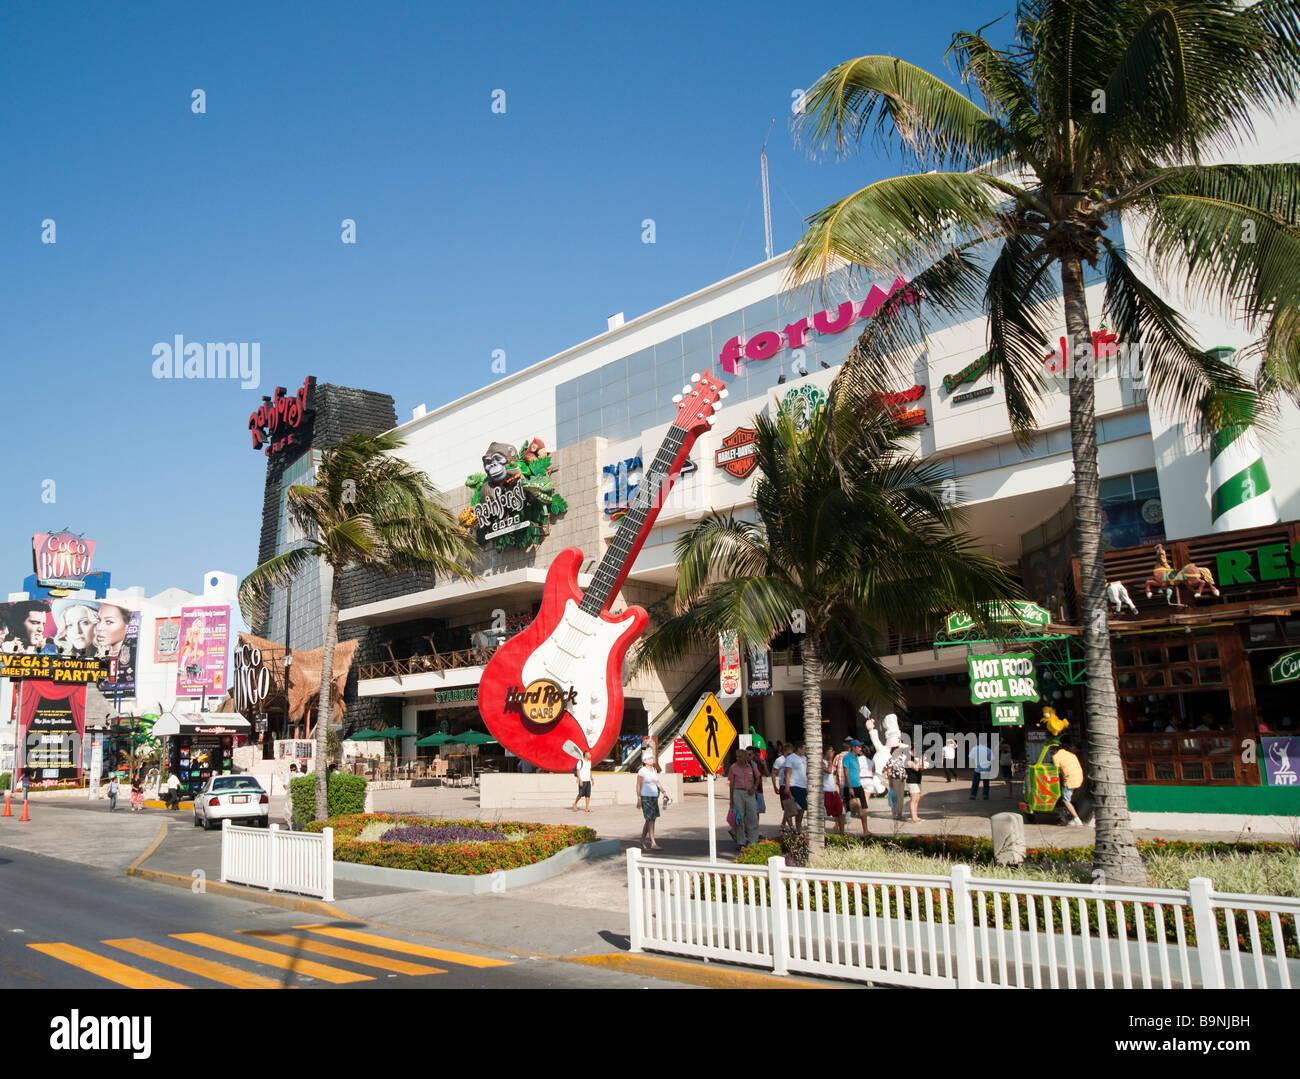 Mexico Yucatan - Cancun zona hotelara with Hard Rock cafe and ...